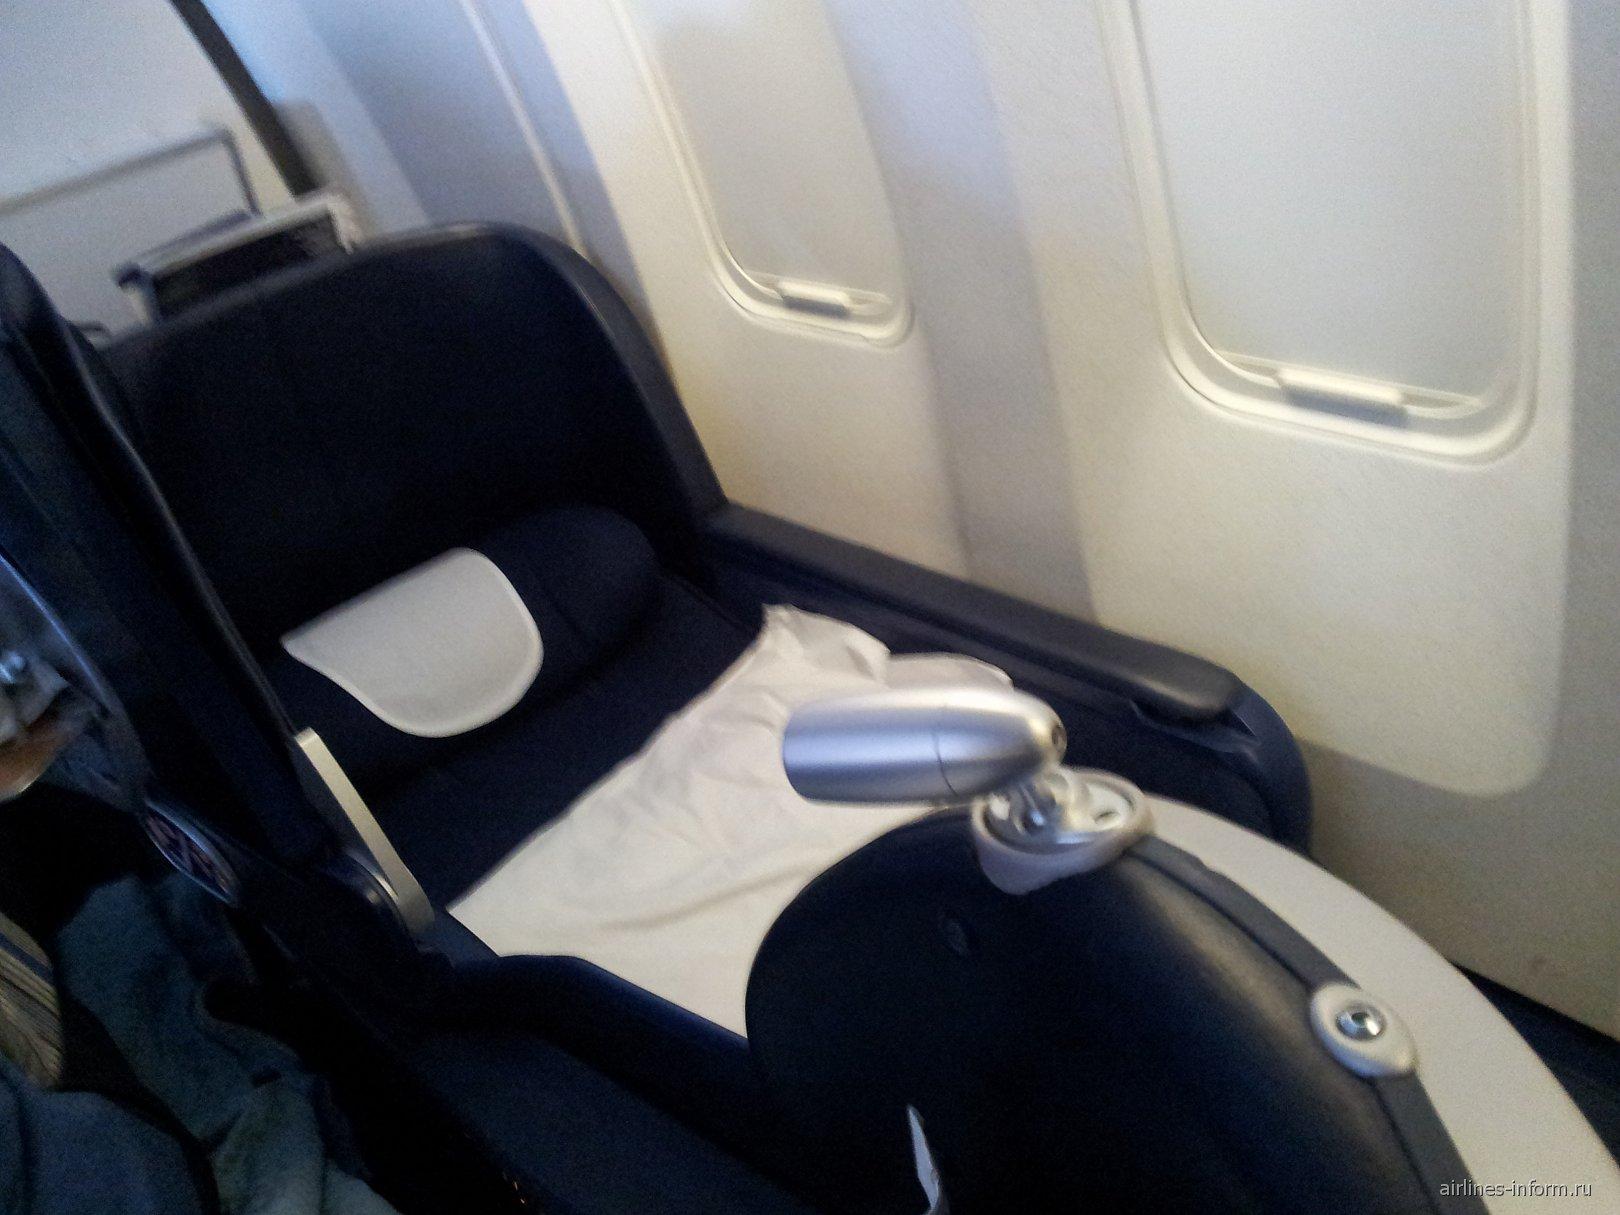 Бизнес-класс в самолете Боинг-767-300 Британских авиалиний